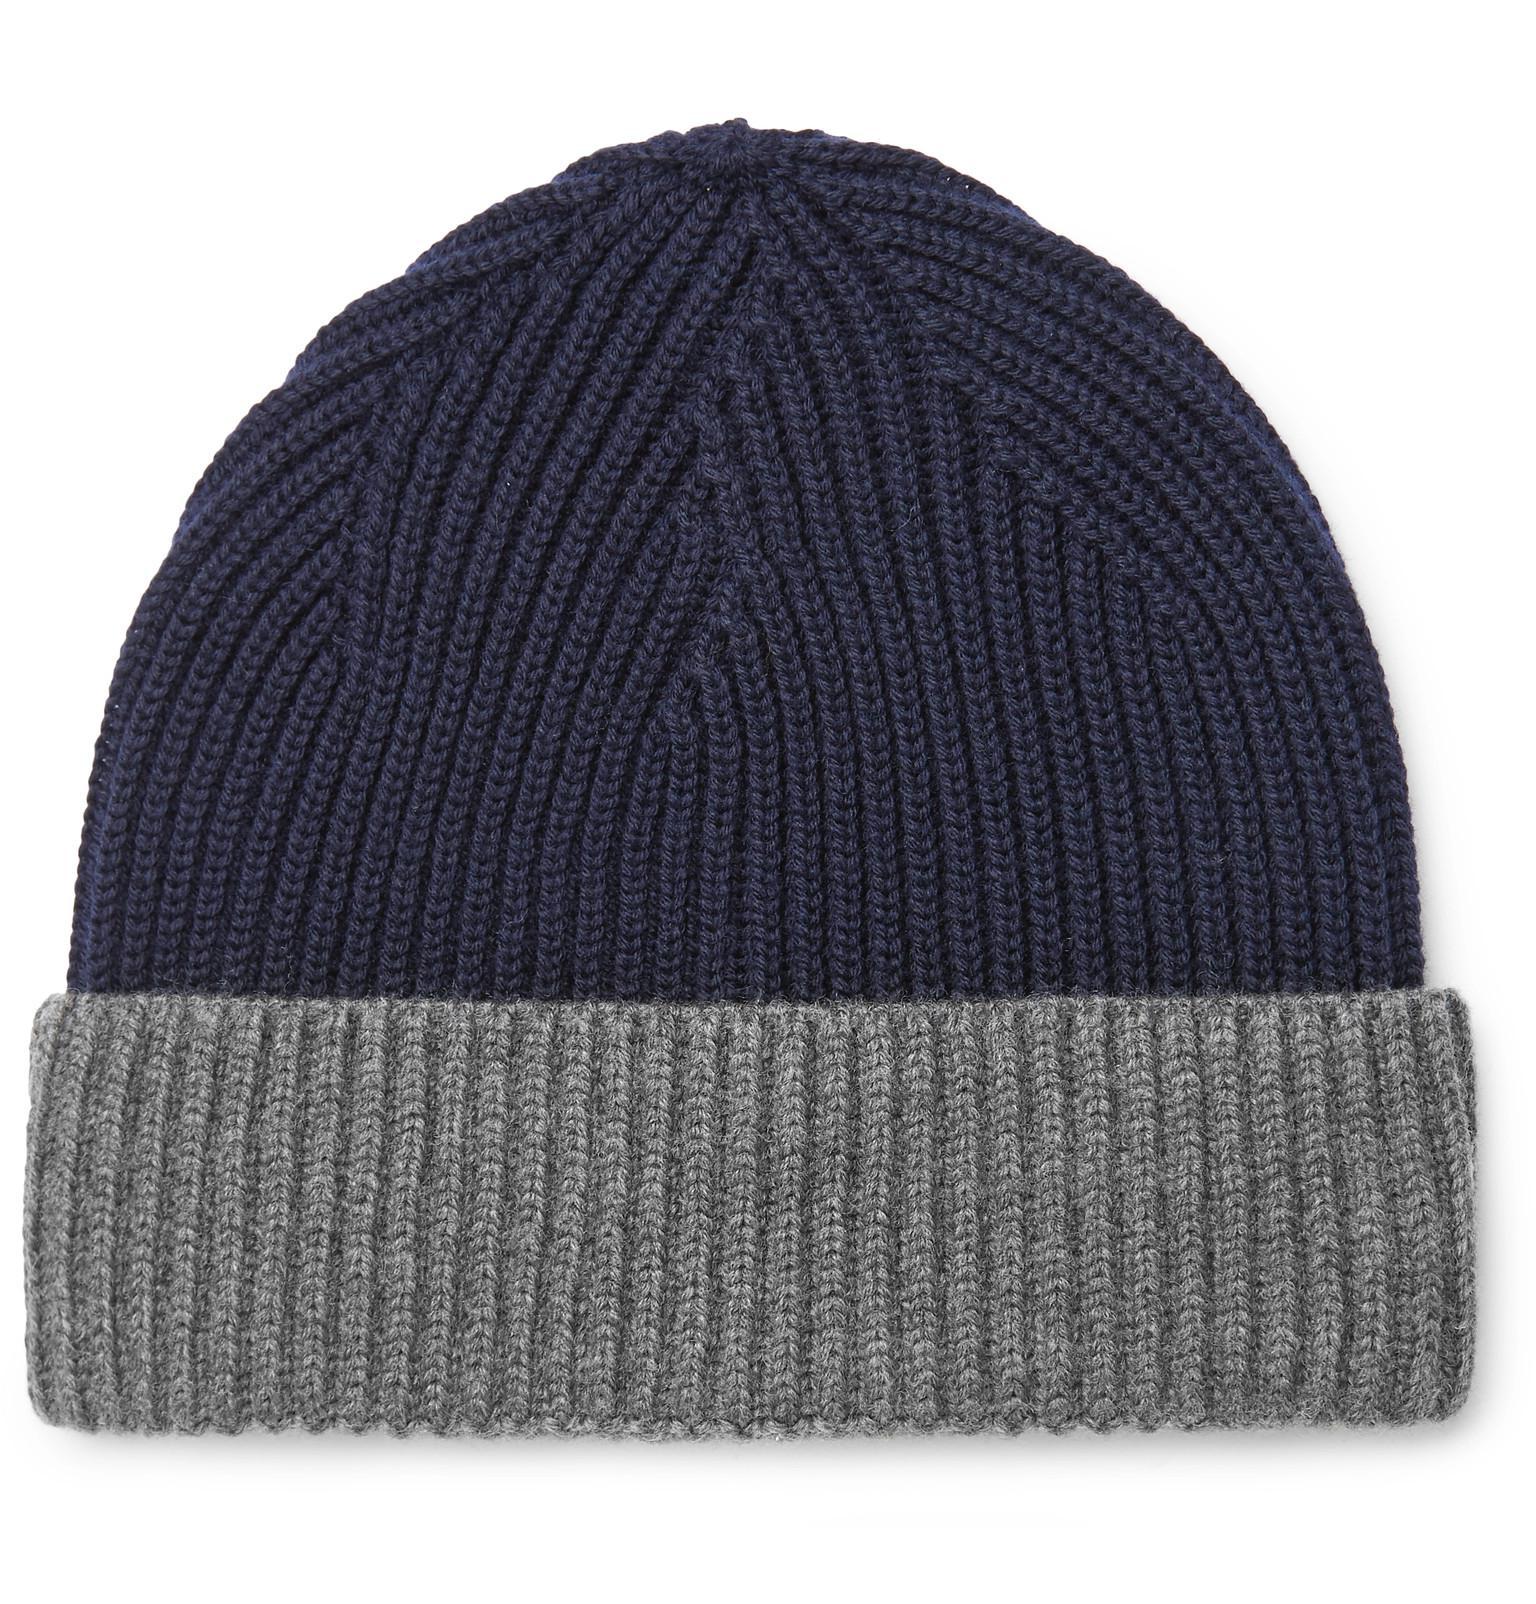 Altea Two-tone Ribbed Virgin Wool Beanie in Blue for Men - Lyst 7dd8edc2edf9